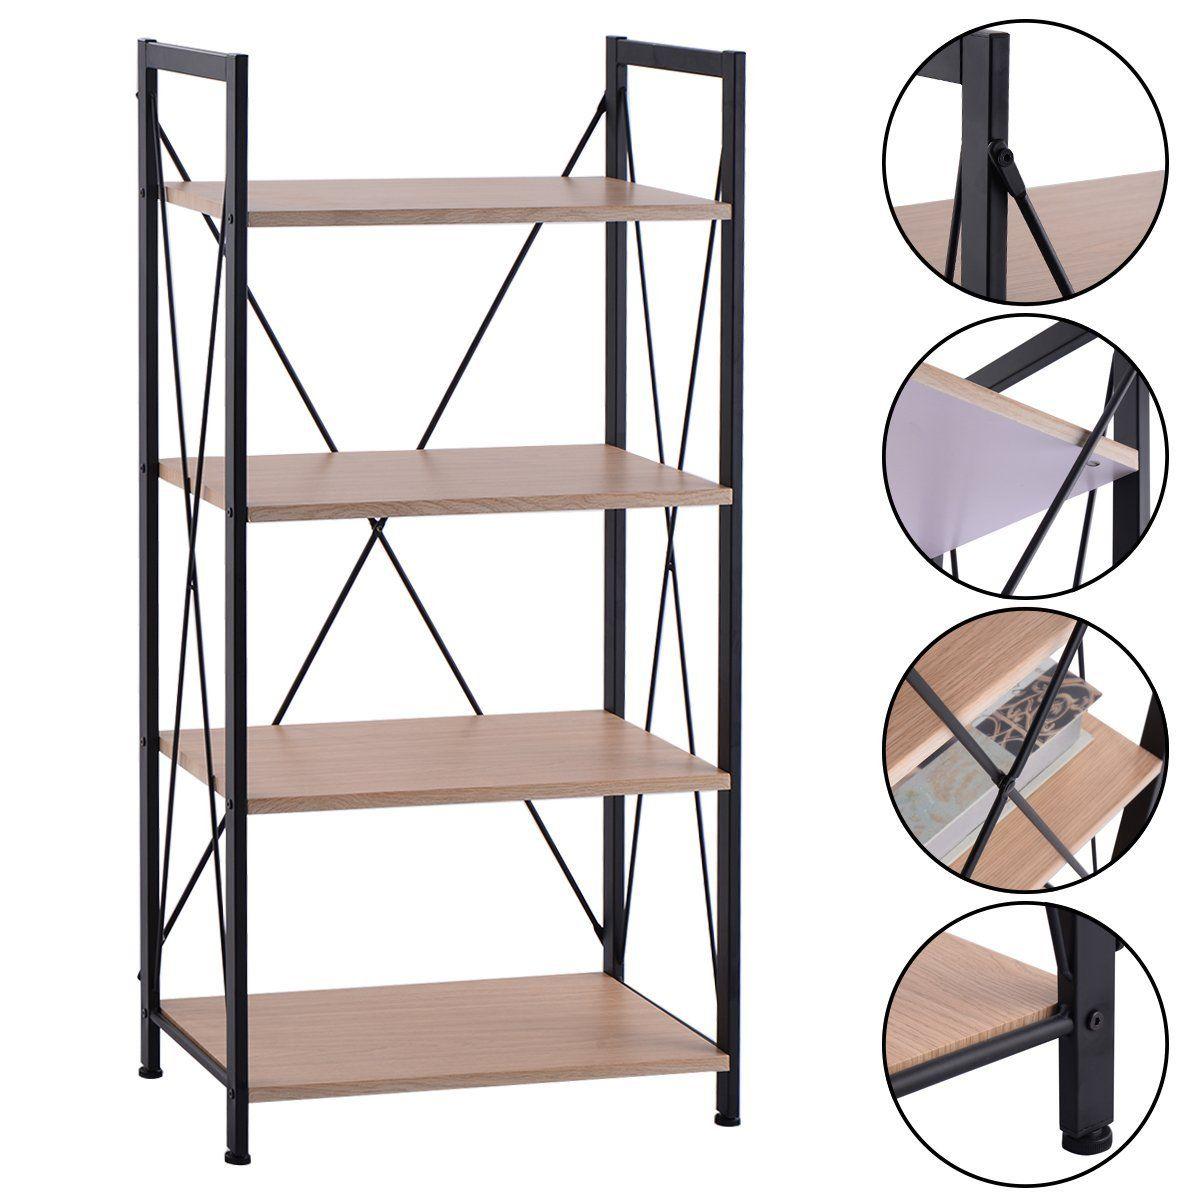 Amazon Giantex 4 Tire Wooden Bookshelf Bookcase Steel Storage Display Shelf Furniture Home